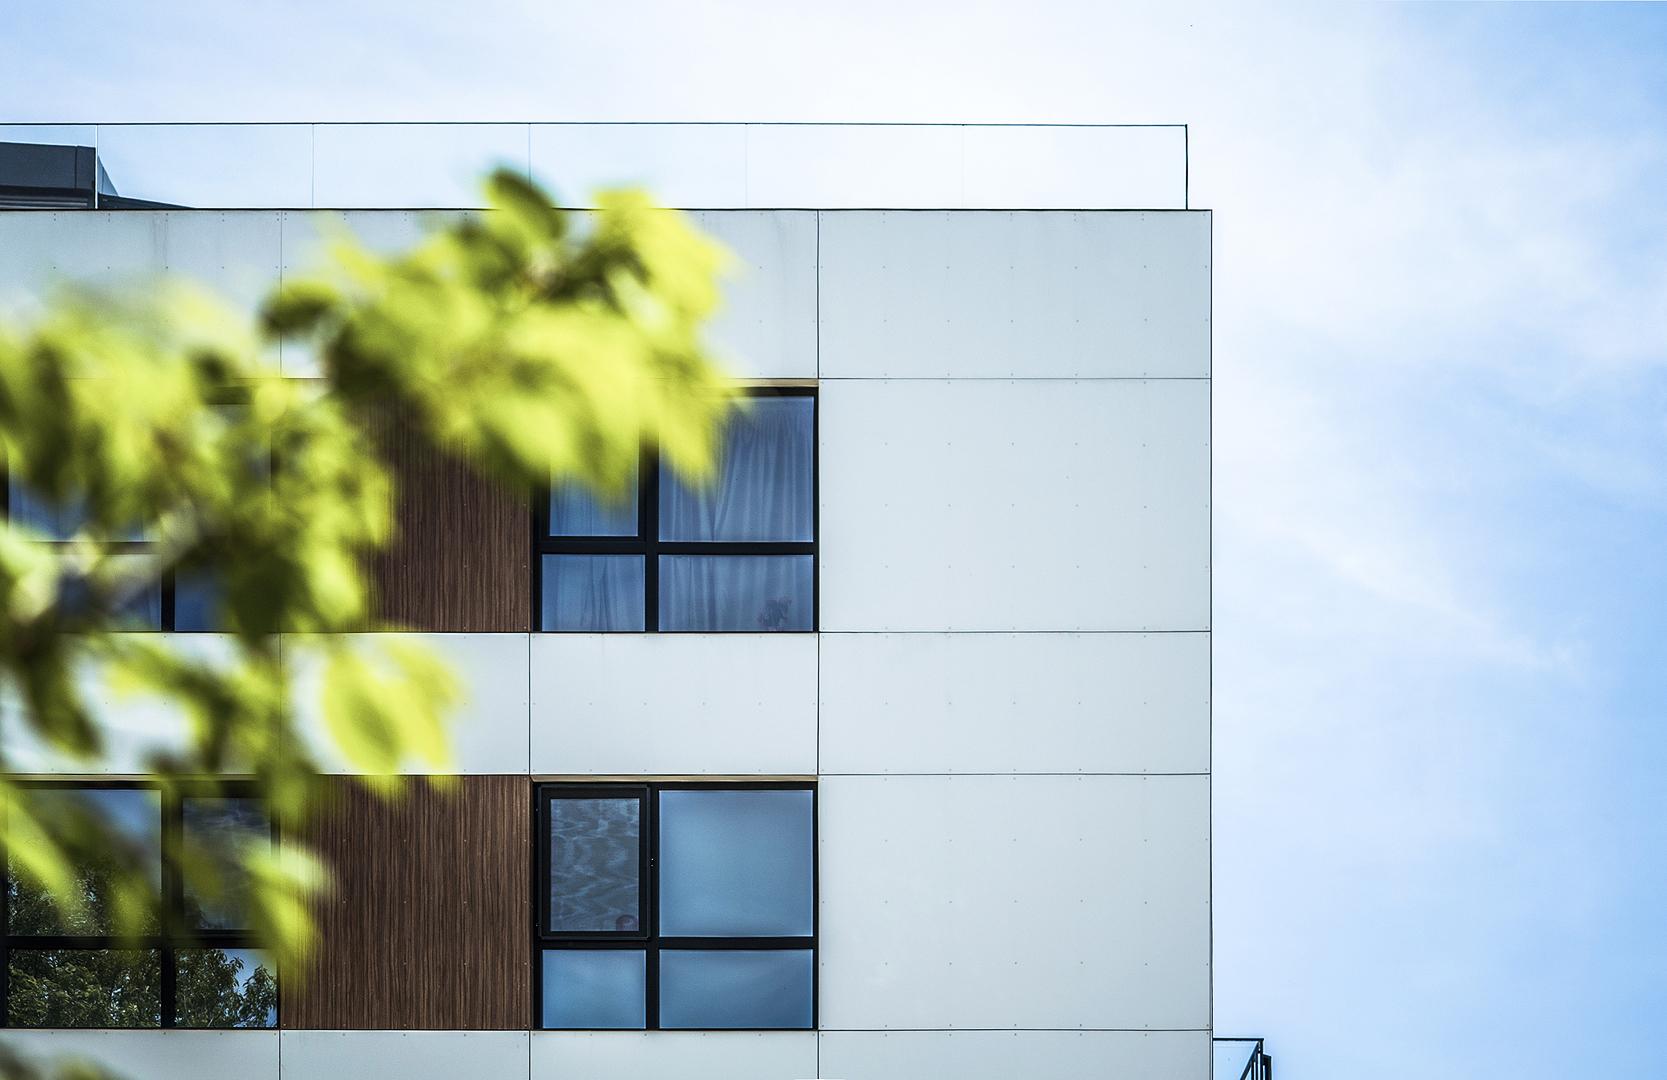 дизайн сгради Варна